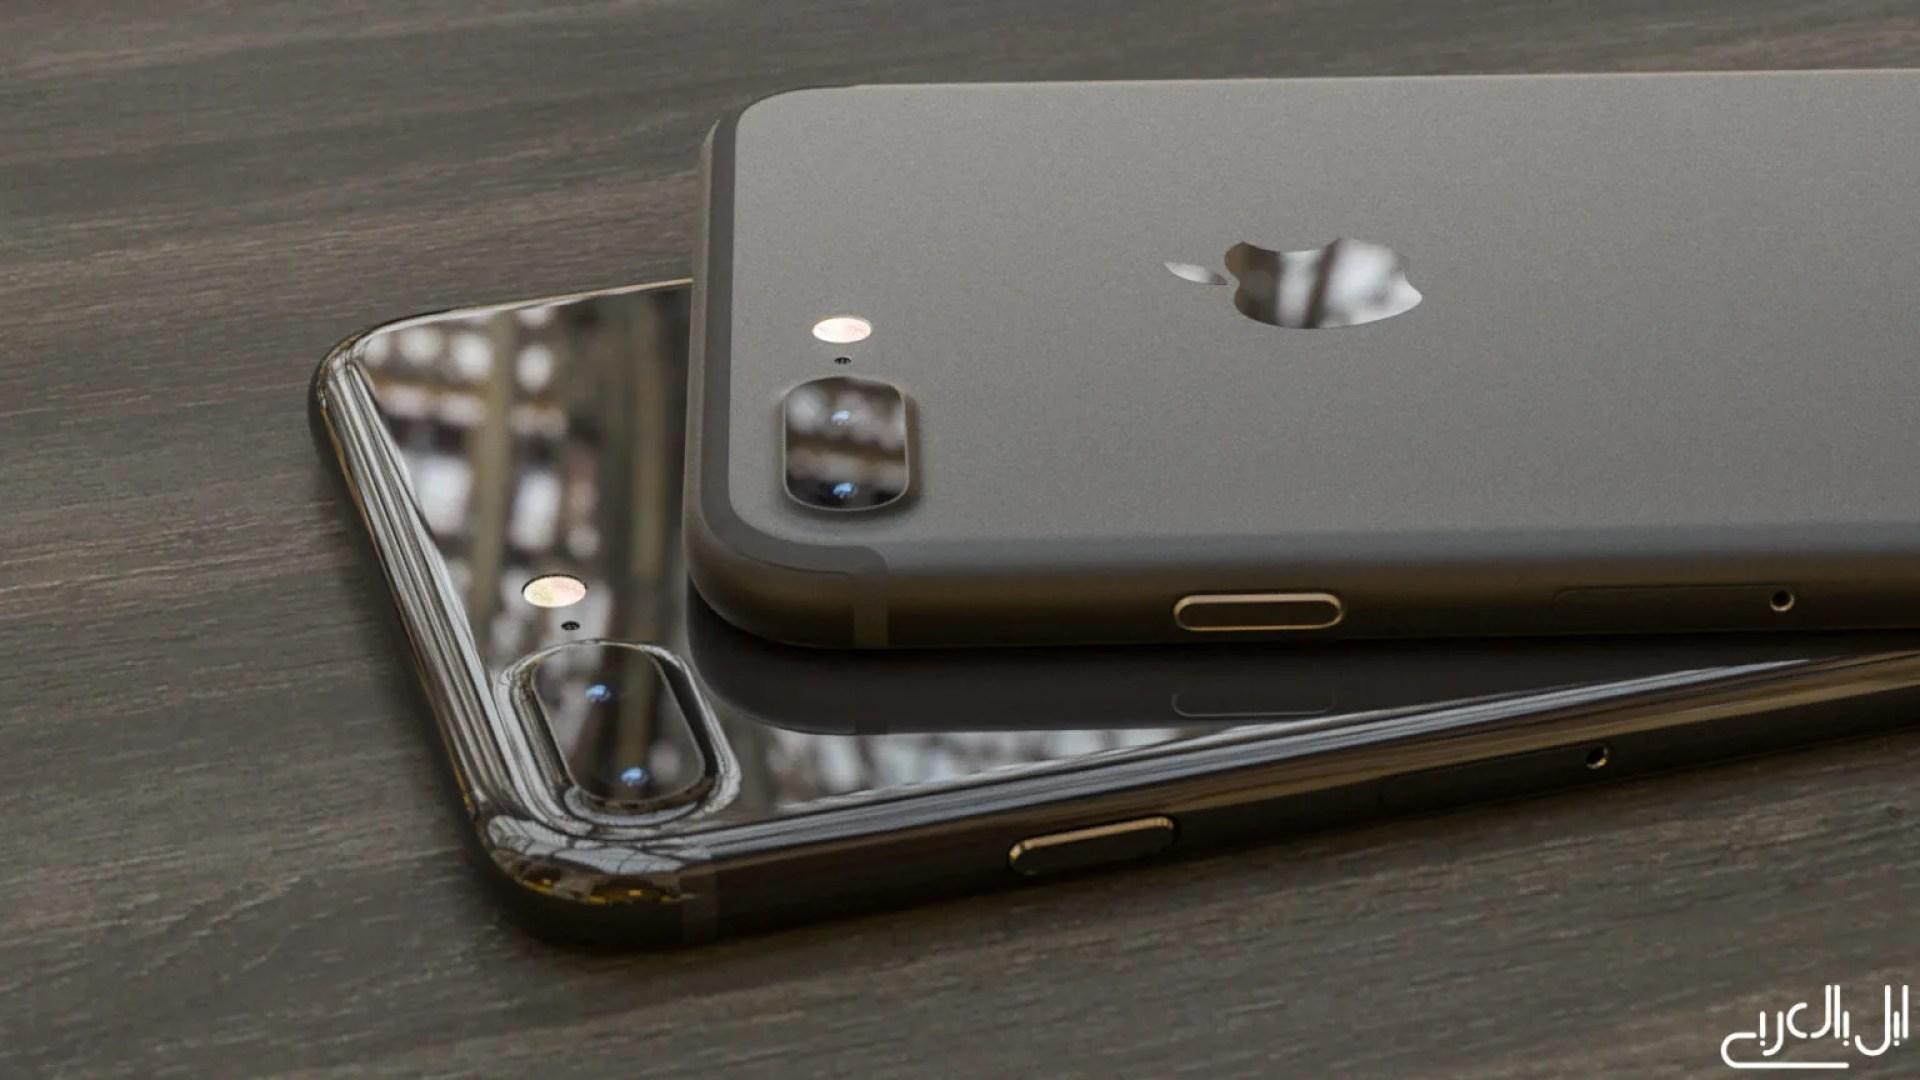 iPhone-7-Plus-Matt-vs-Glossy-Black-Corona